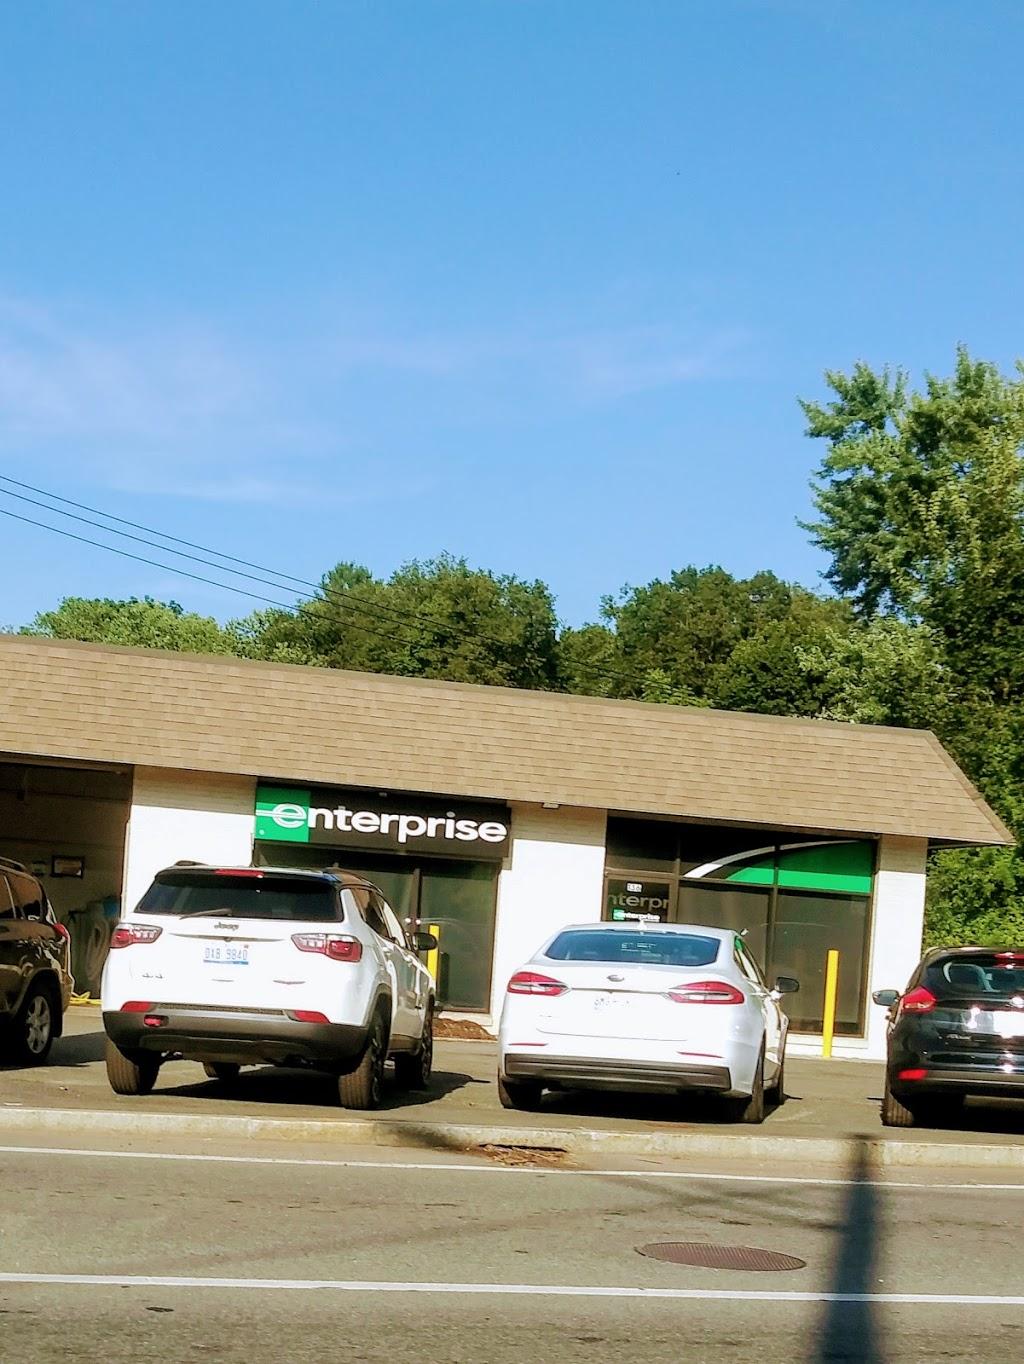 Enterprise Rent-A-Car - car rental  | Photo 2 of 10 | Address: 136 River St, Greenfield, MA 01301, USA | Phone: (413) 774-5092